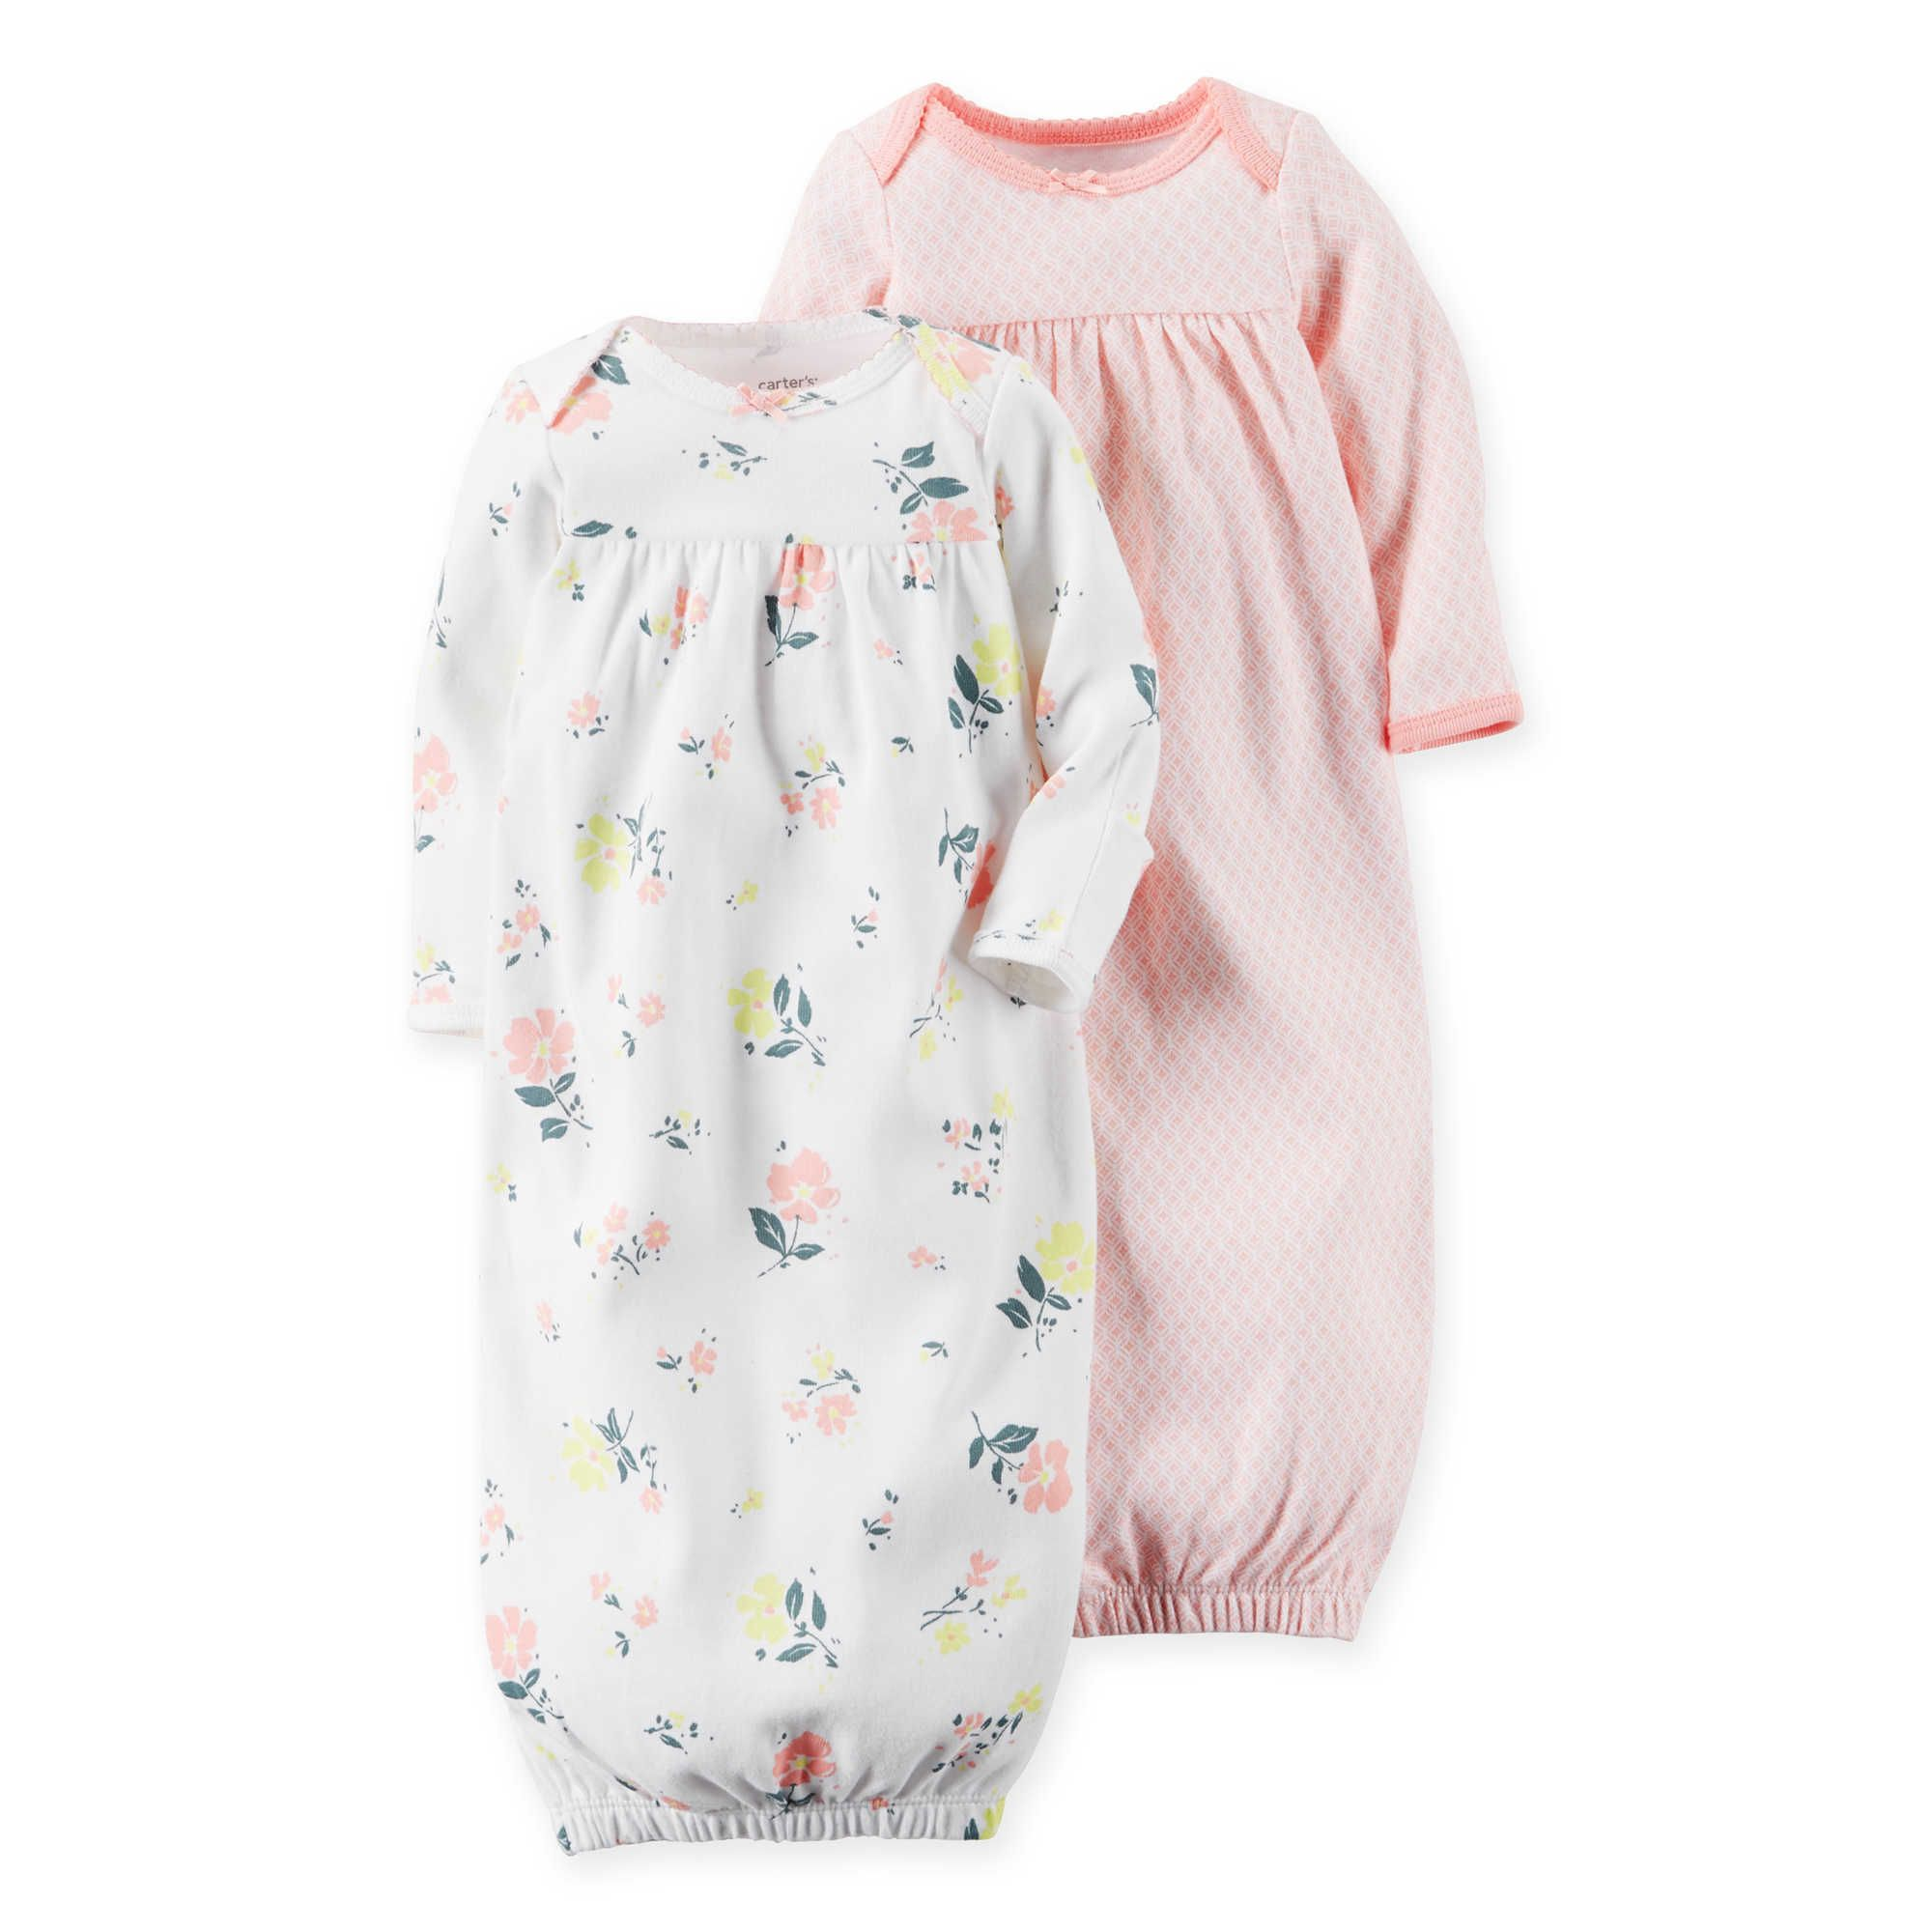 carter s newborn 2 pack babysoft floral sleeper gowns l i t t l e